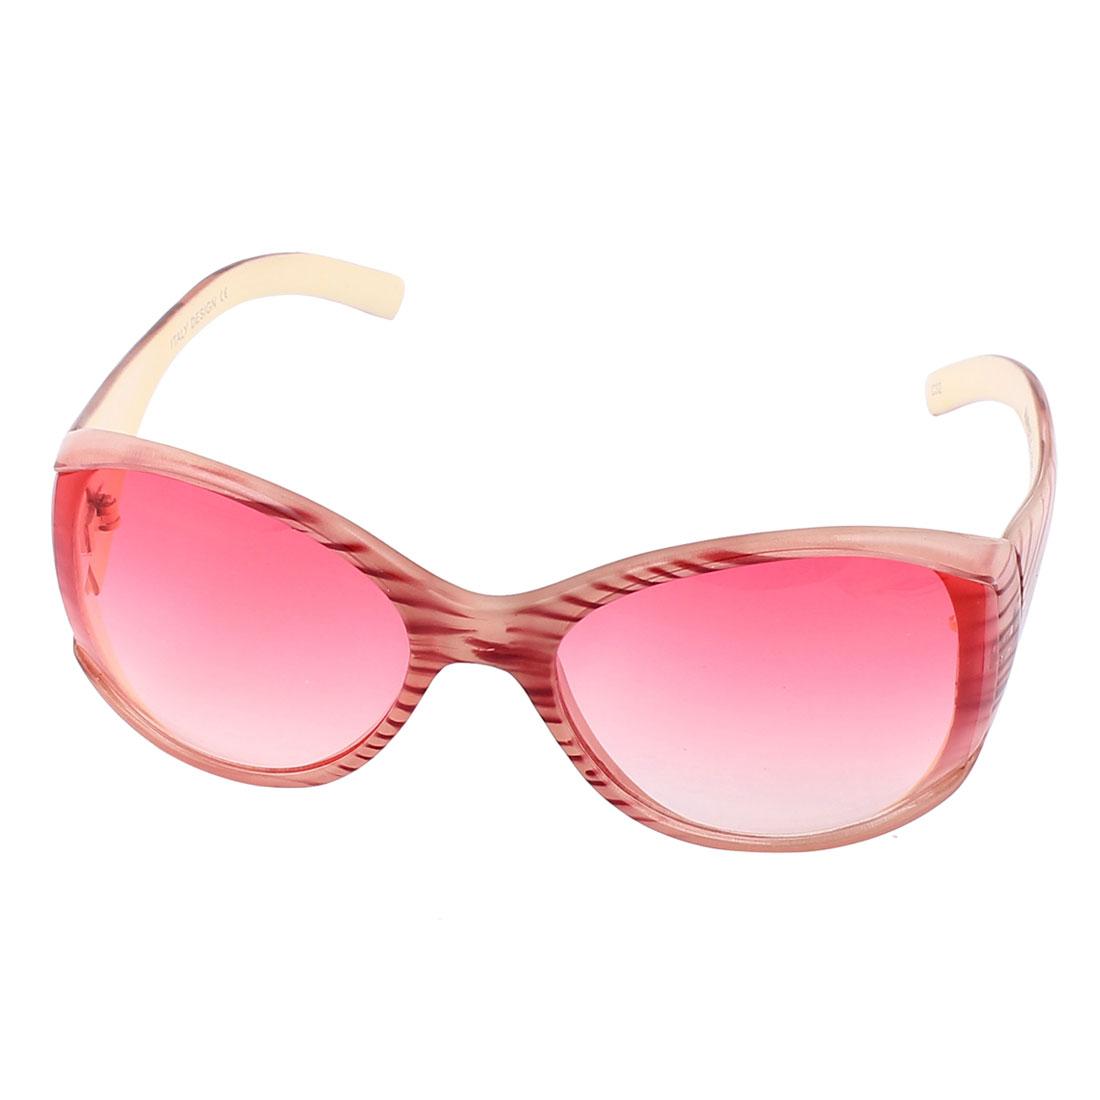 Full Frame Sun Protective Outdoor Eyewear Googles Sunglasses Pink